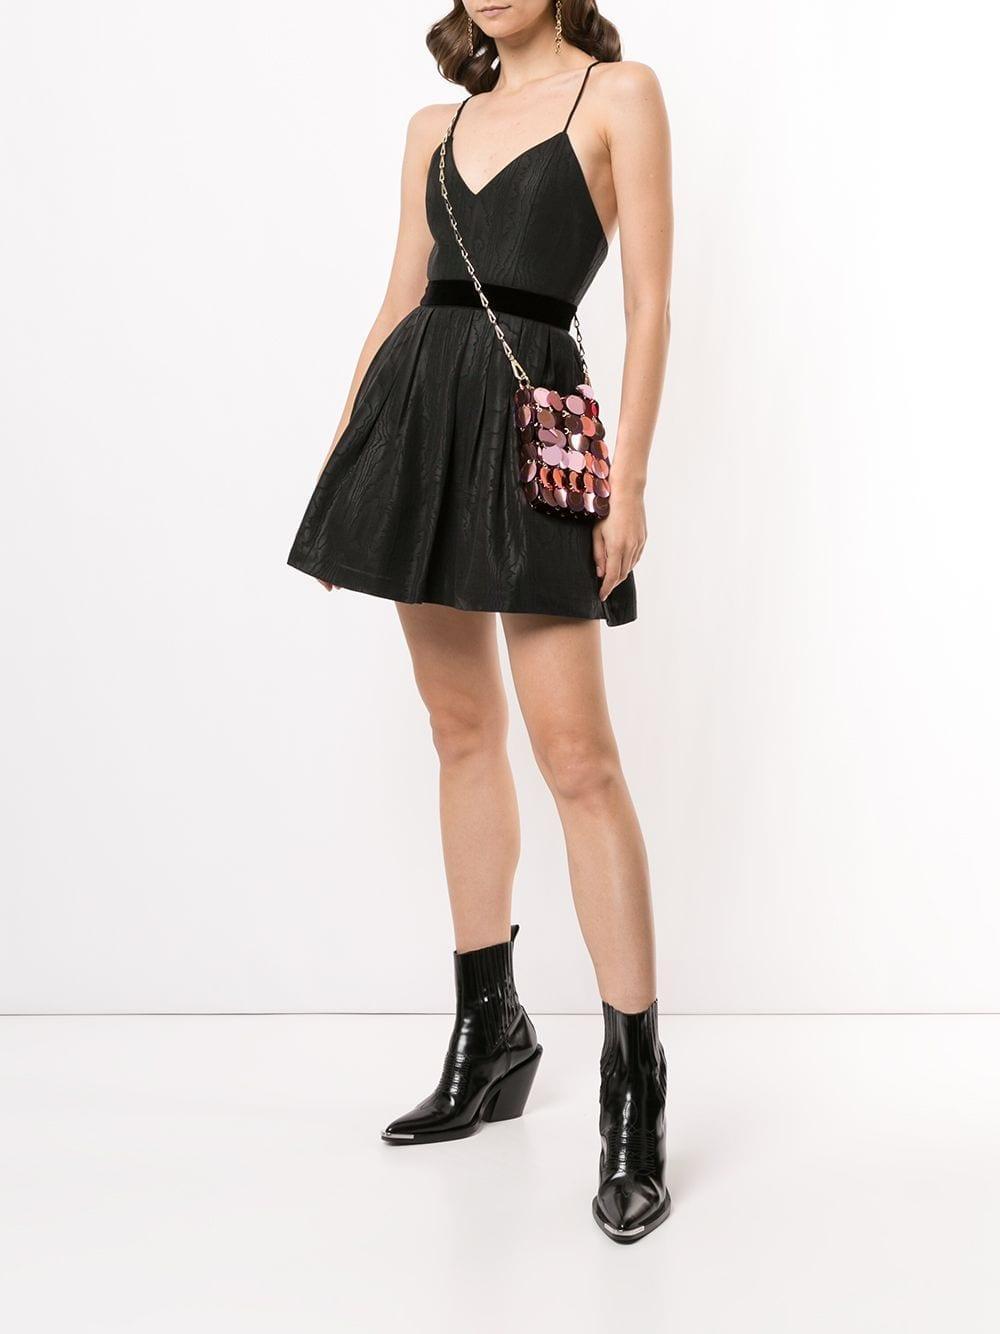 ALICE+OLIVIA Madison Mini Dress